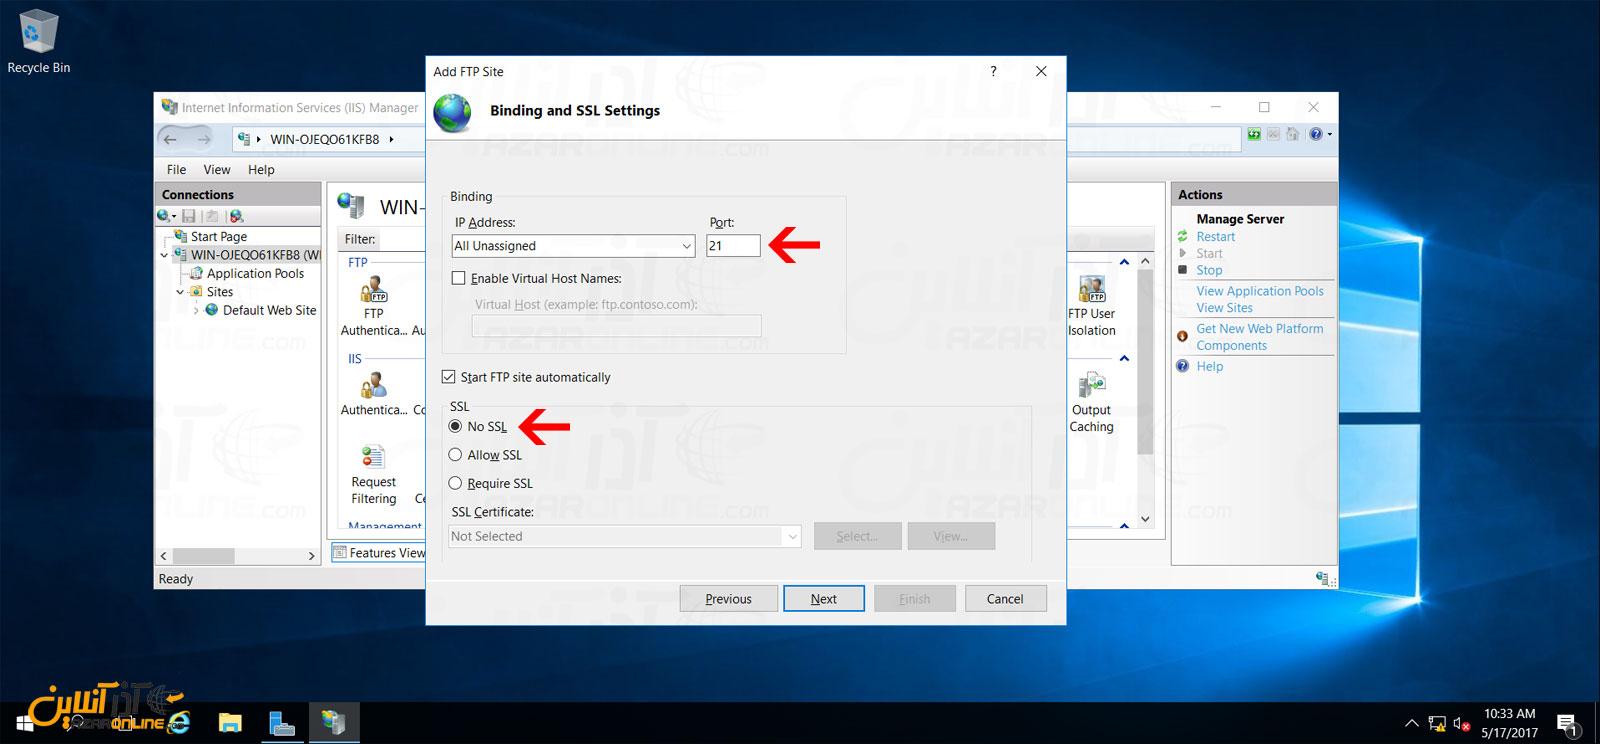 انتخاب پورت و گواهینامه امنیتی FTP